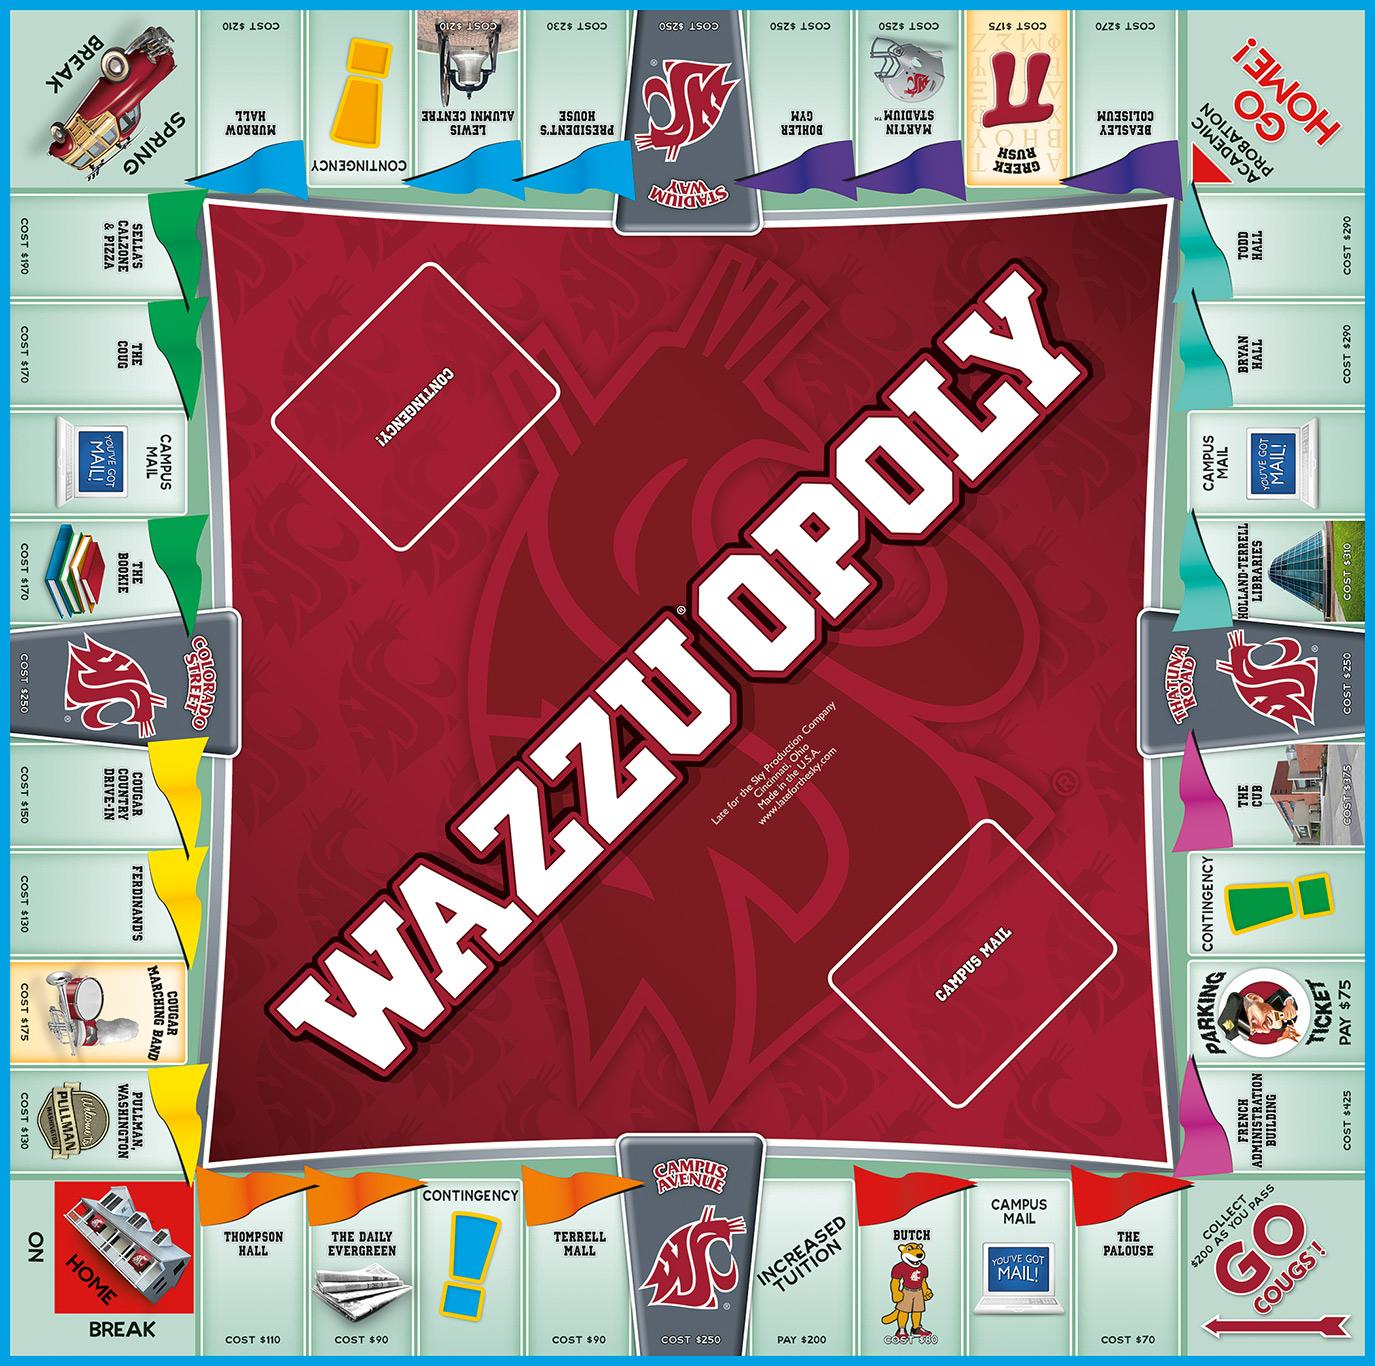 WAZZU-OPOLY Board Game